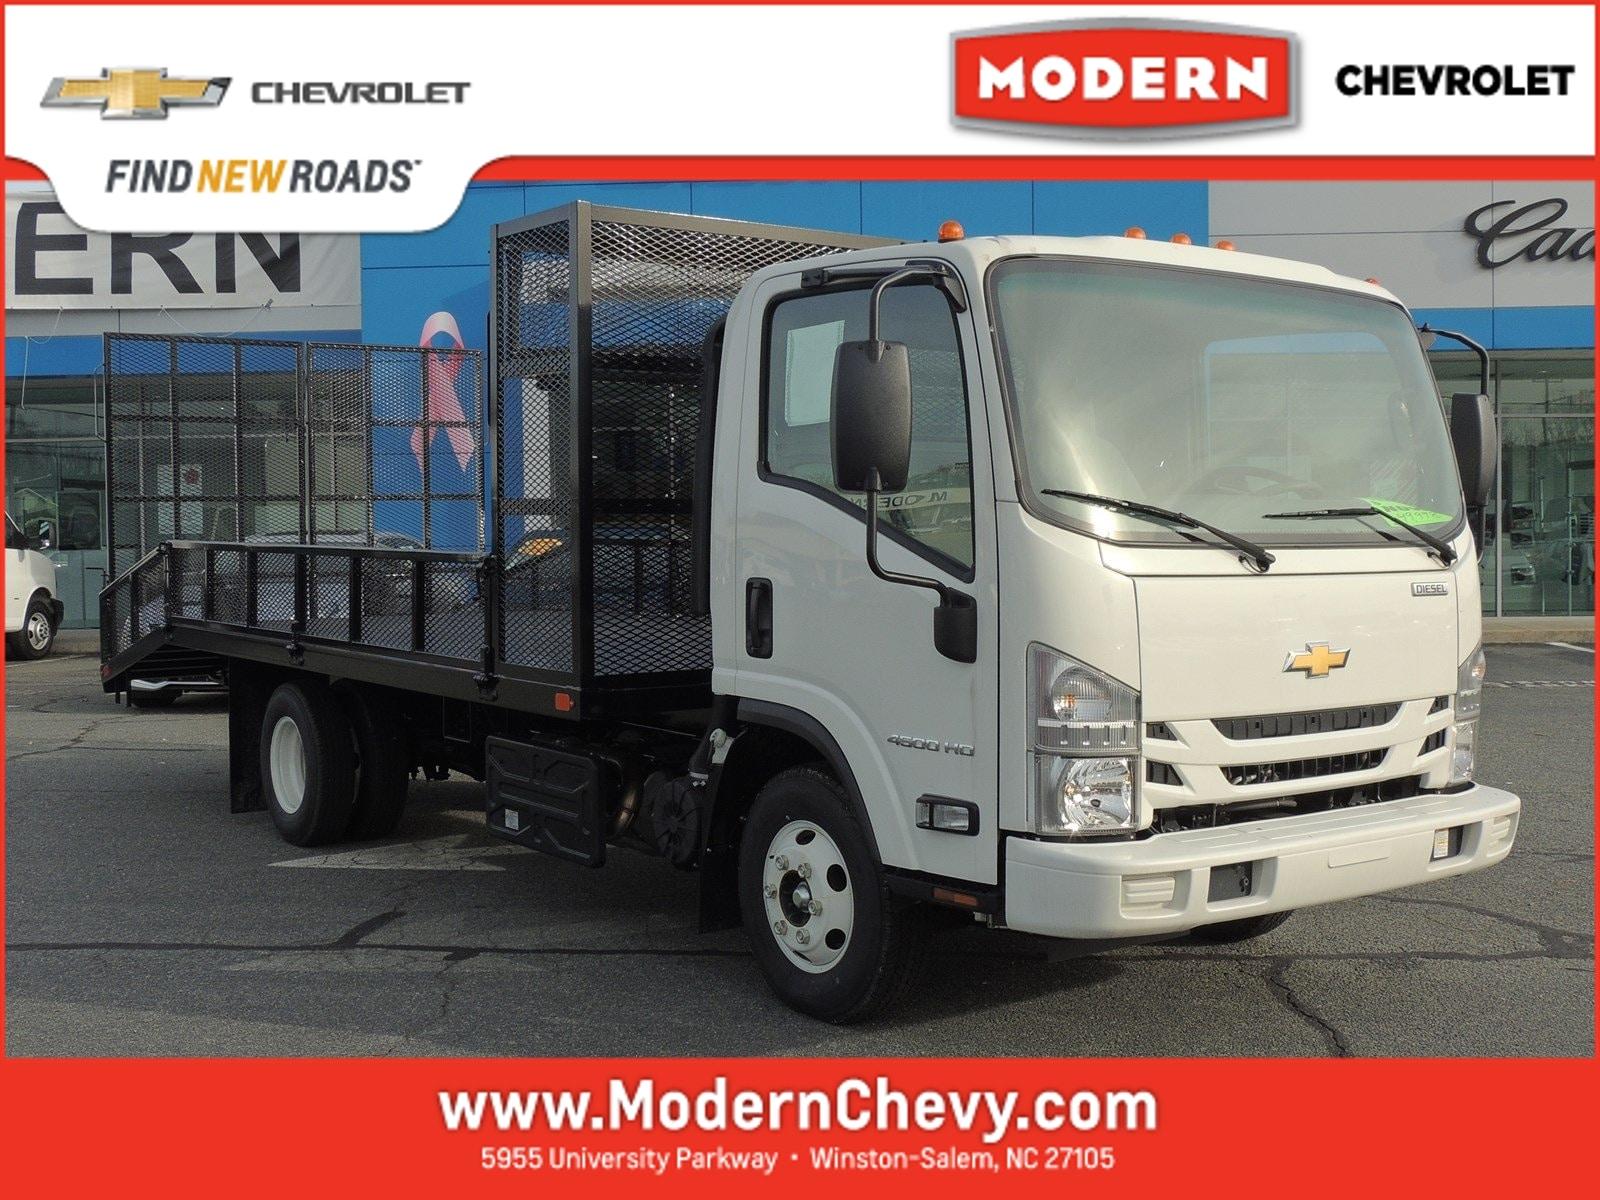 2018 Chevrolet 4500HD LCF Diesel 150